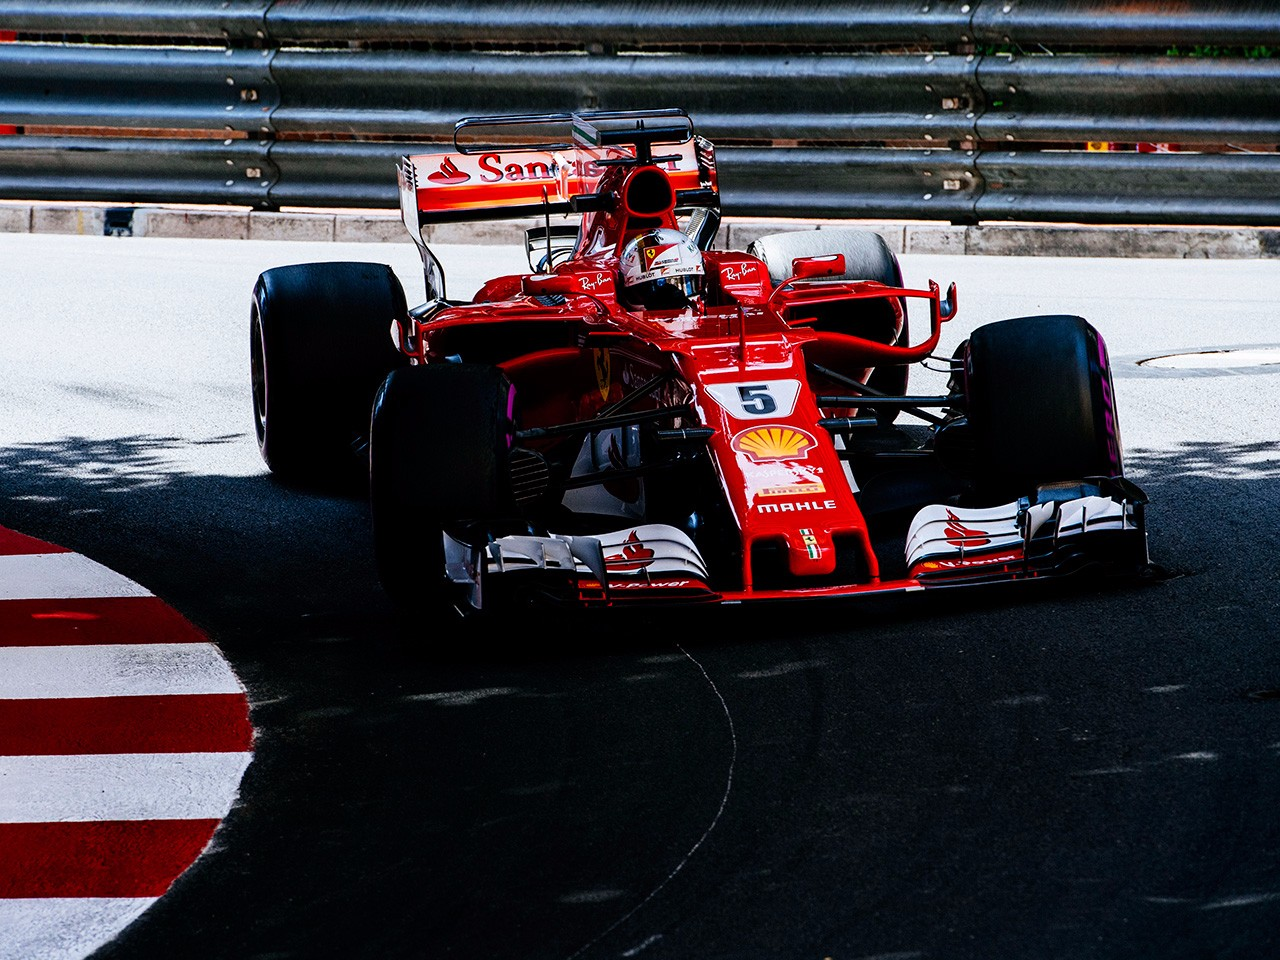 Ferrari in front in FP2